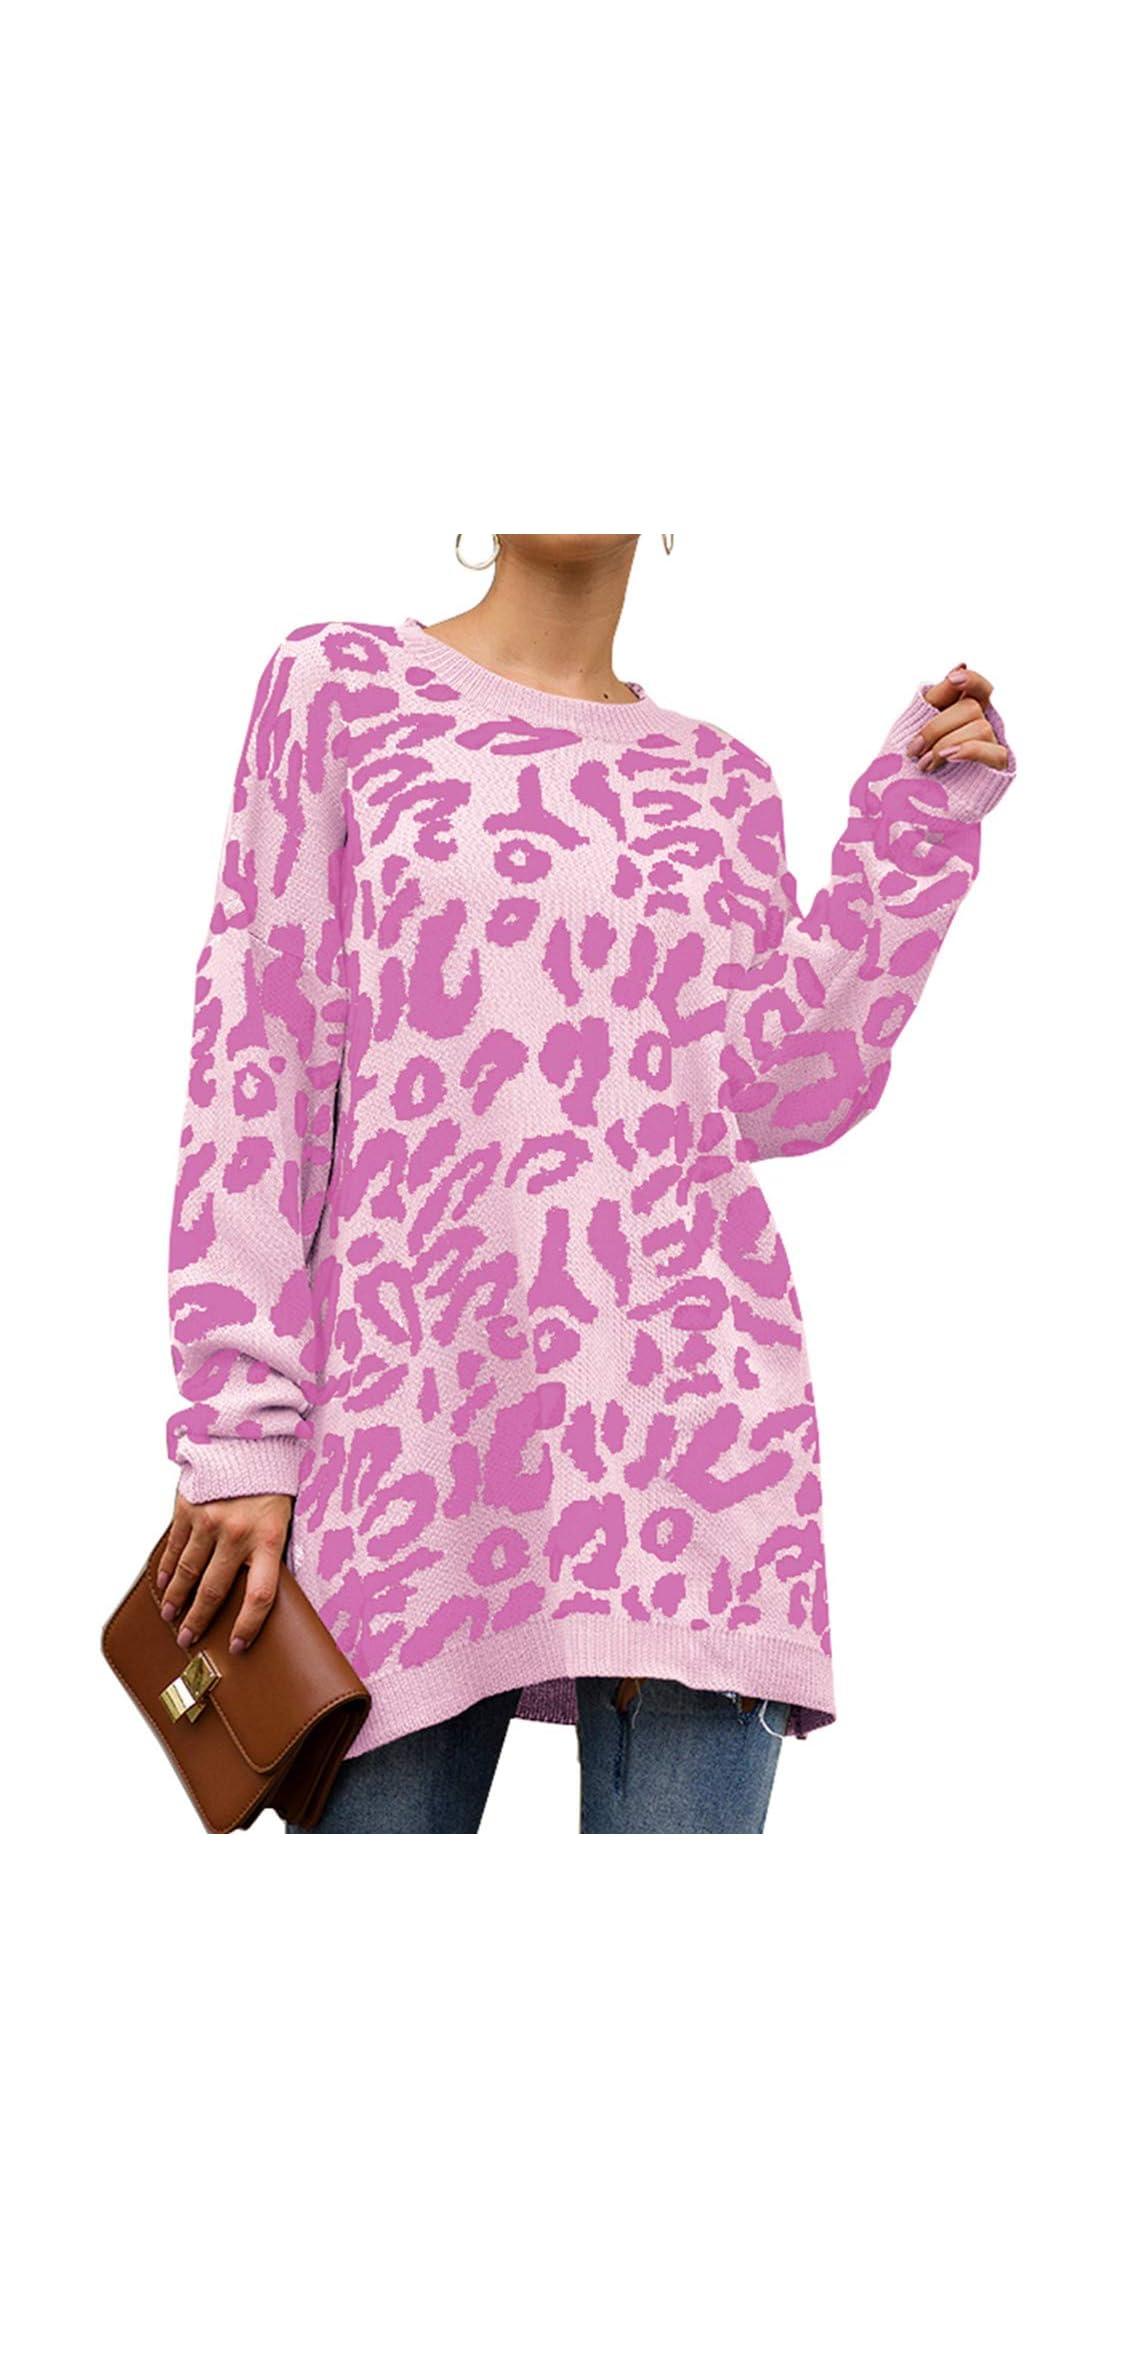 Leopard Print Oversized Sweater Loose Fit Knitwear For